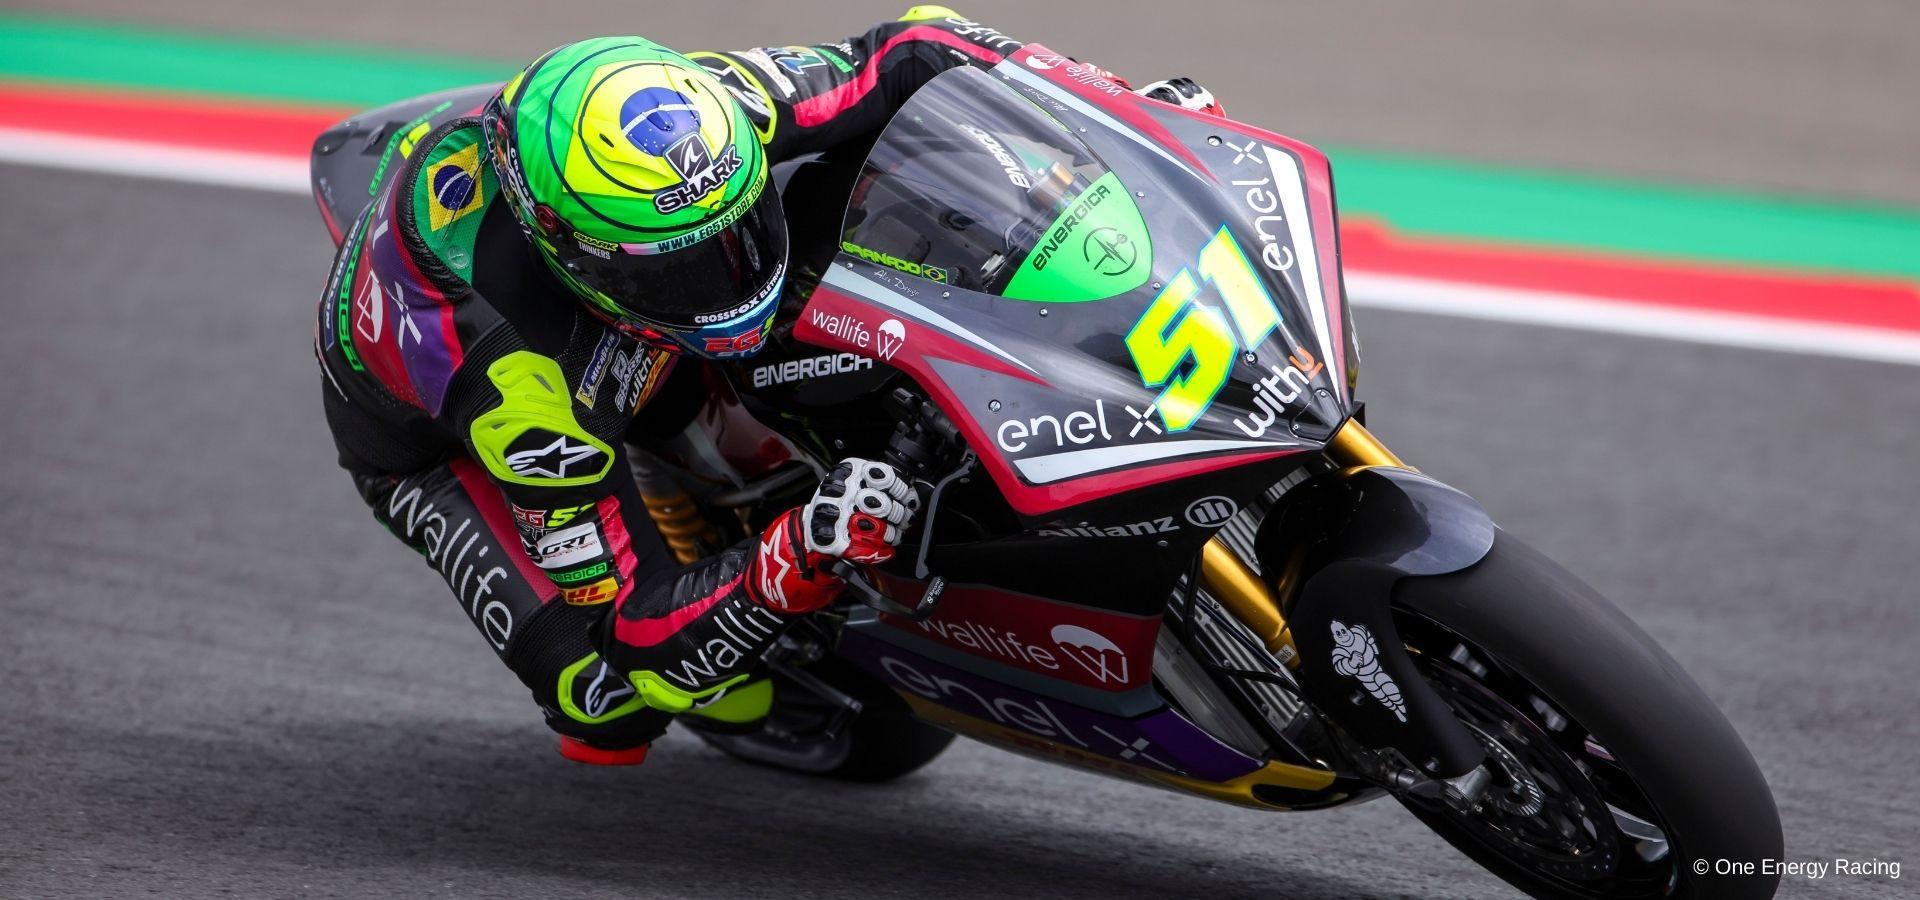 San Marino GP FP1: Granado takes the lead